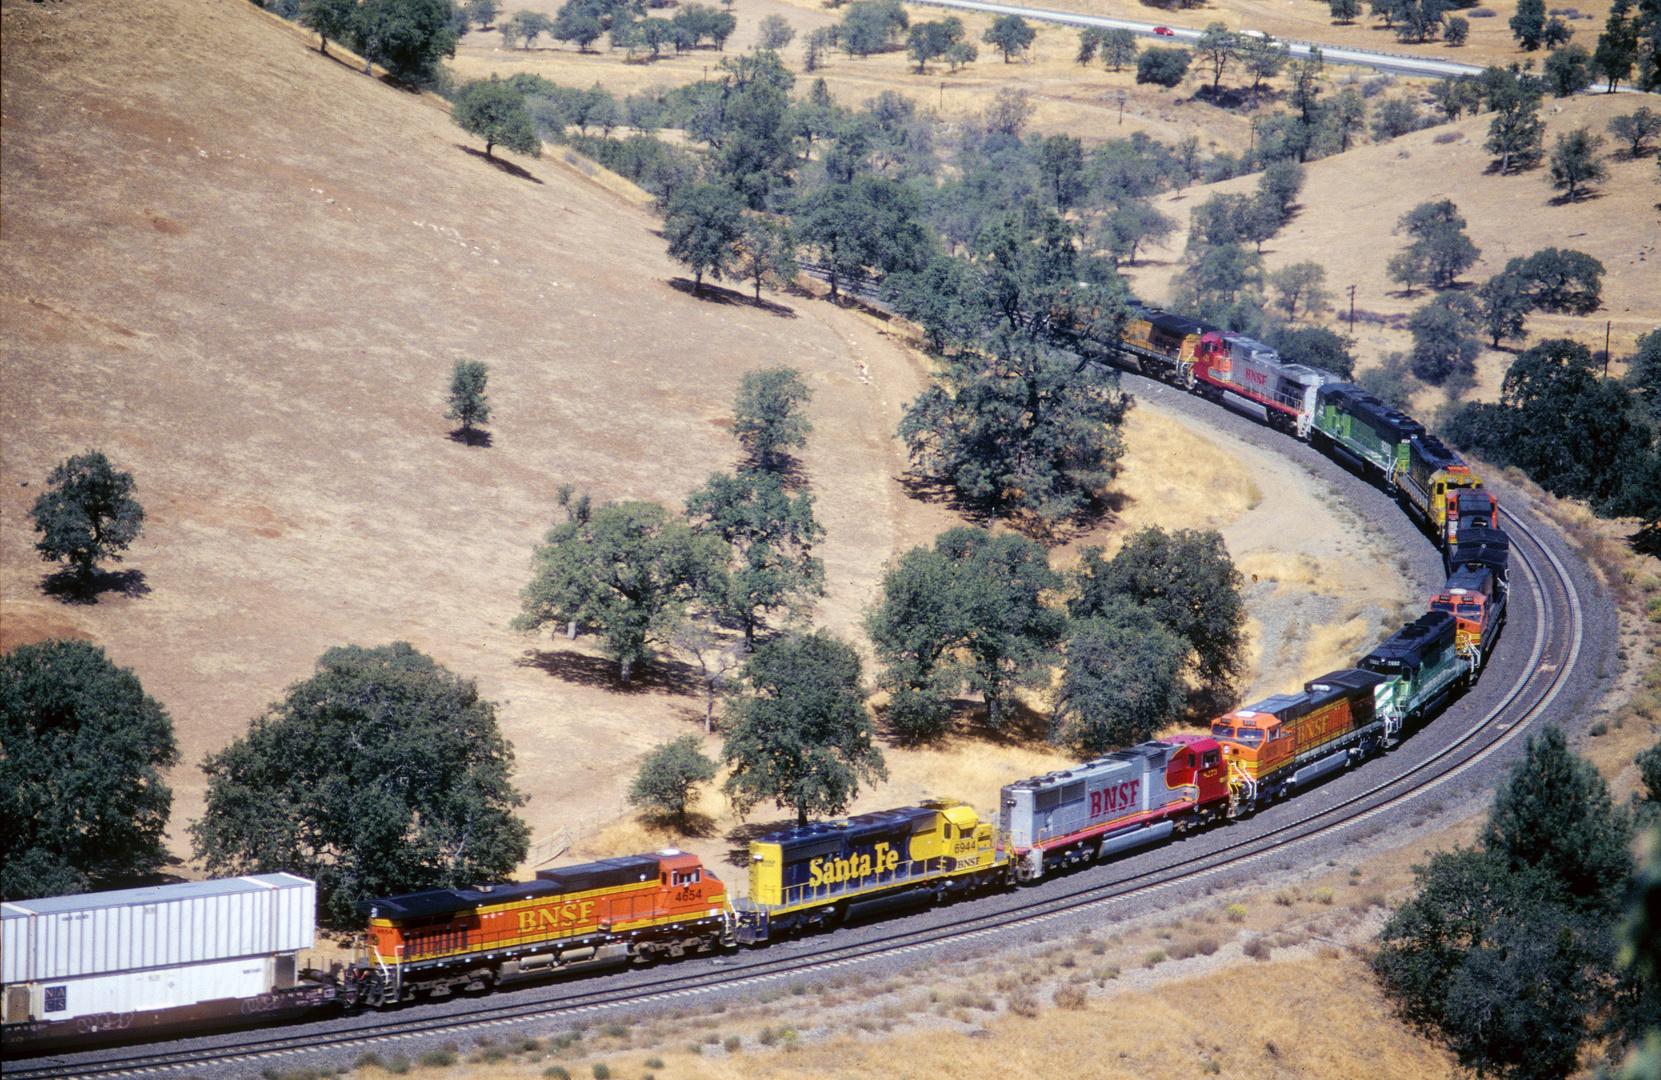 11 Lokomotiven der BNSF ziehen am Tehachapi Loop bergaufwärts einen ca. 2 km langen Güterzug, CA